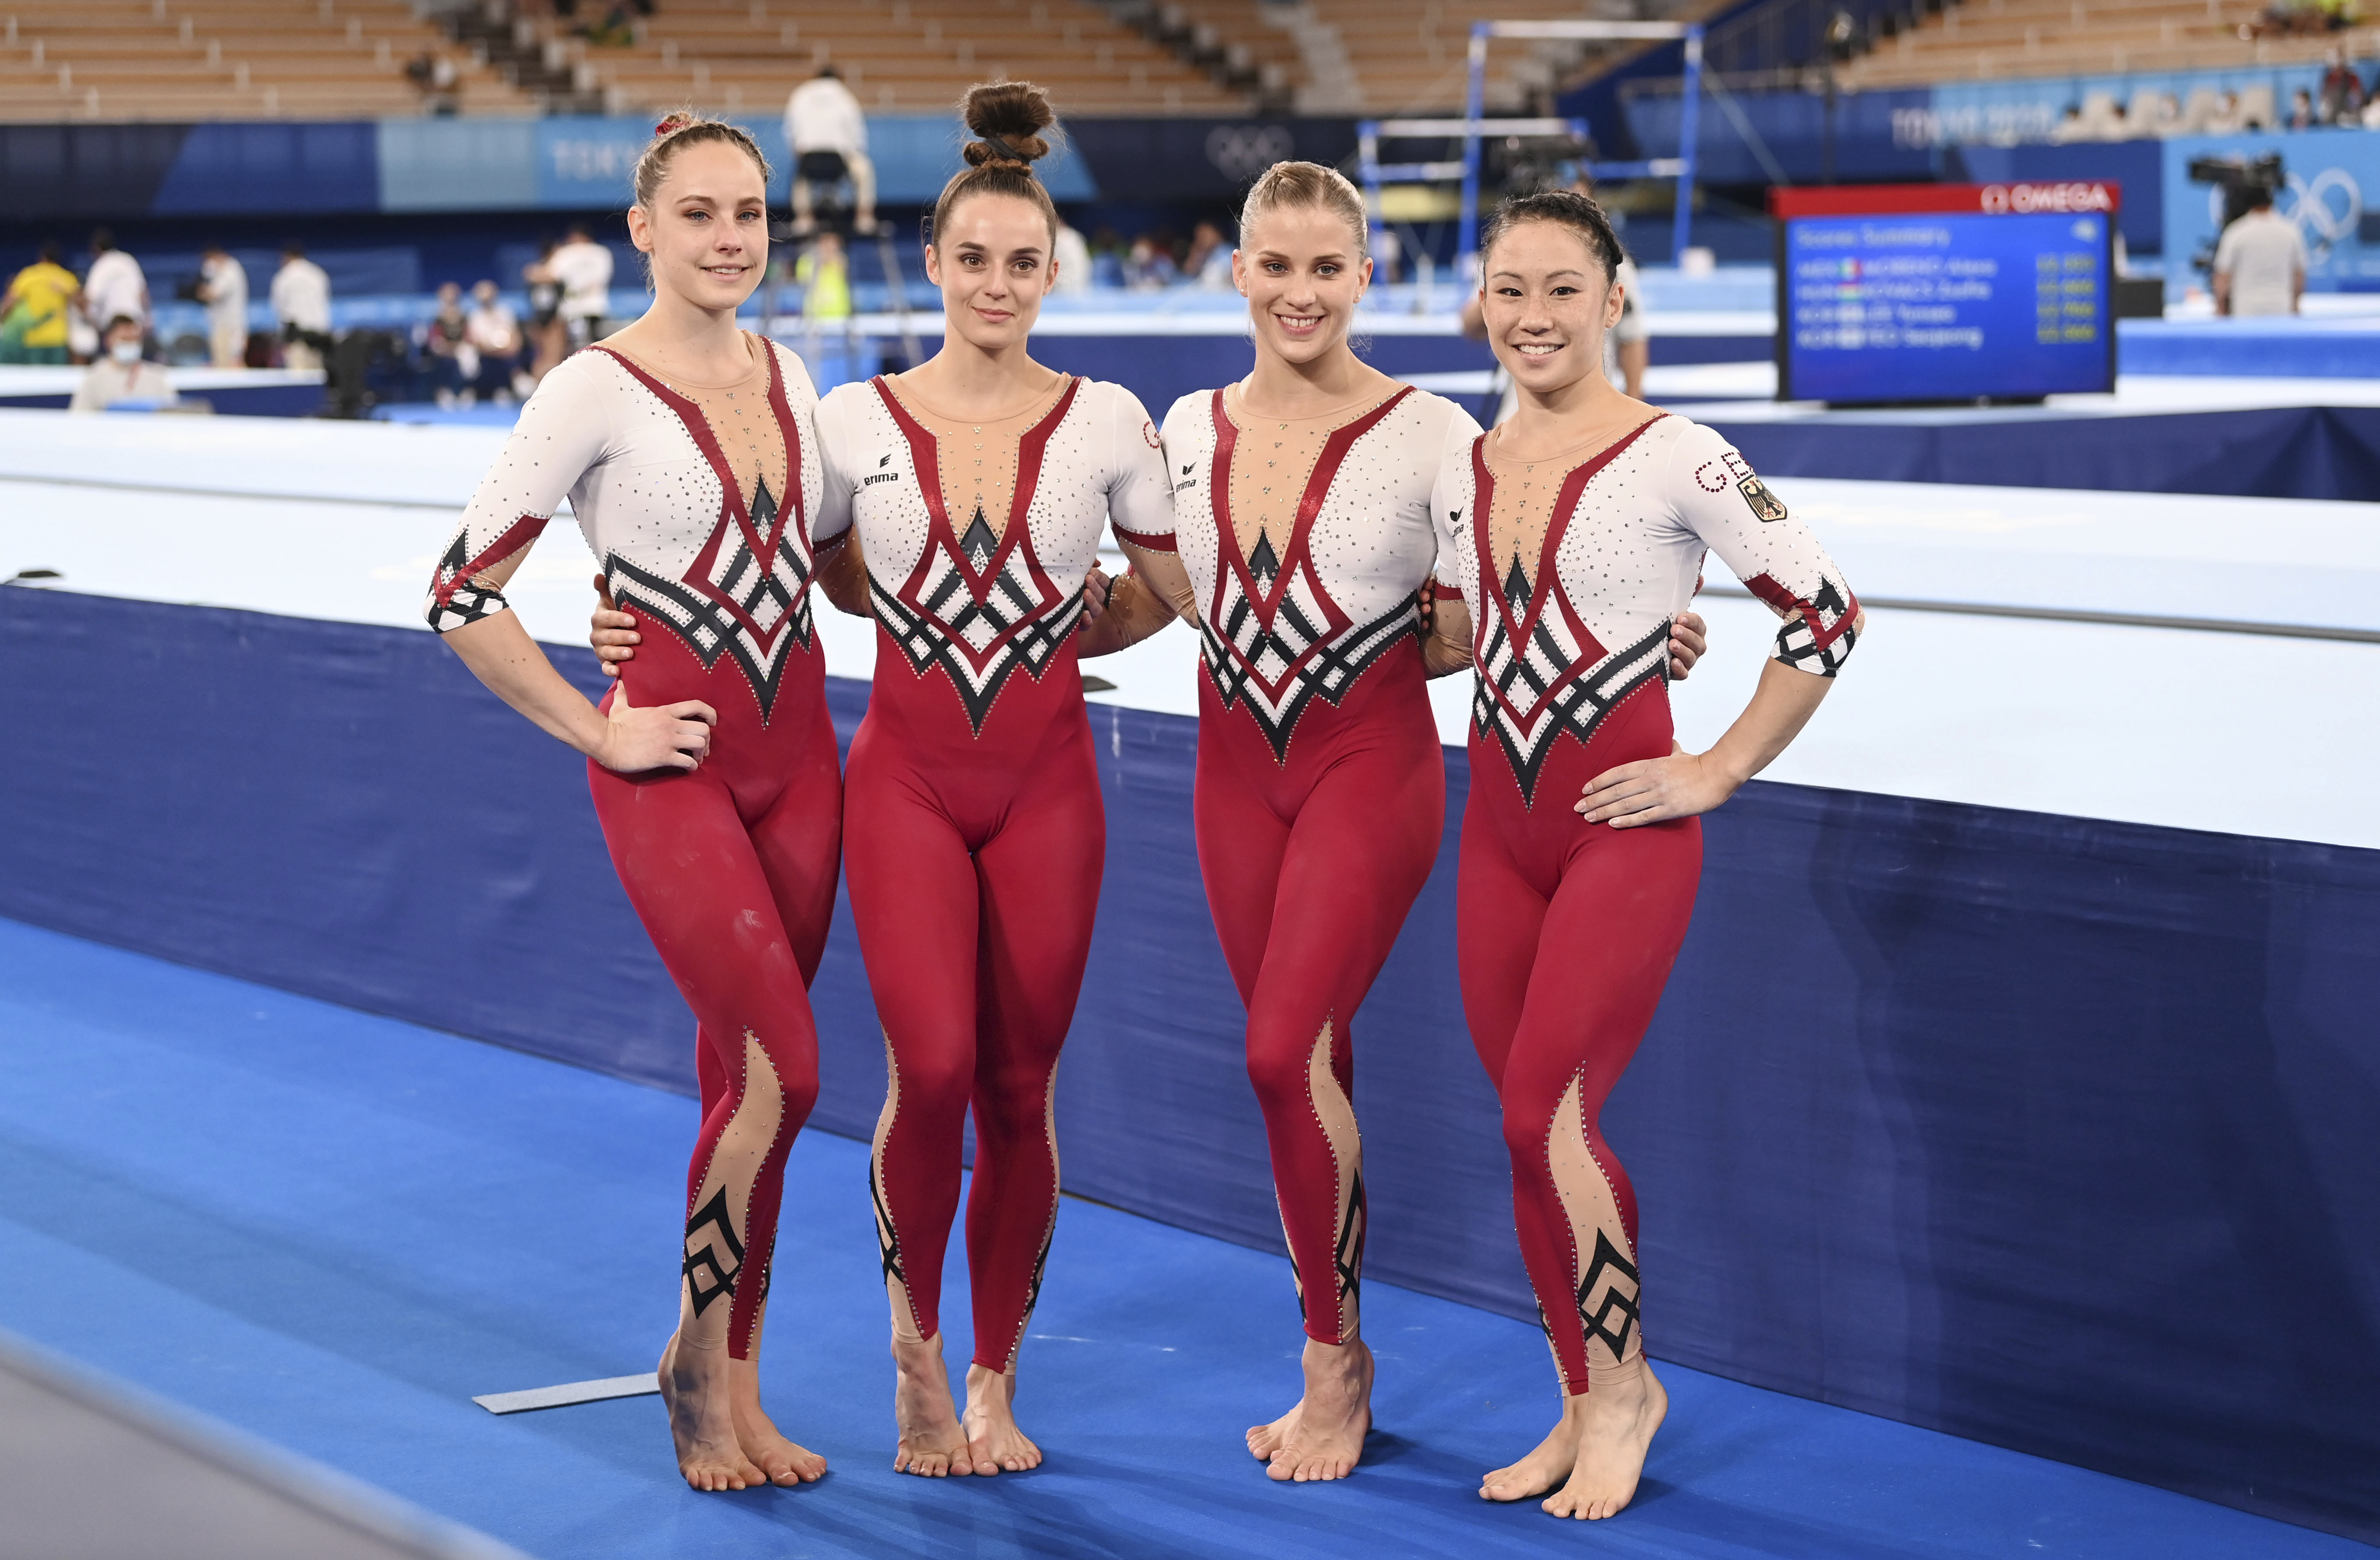 Tokyo Summer Olympics Uniform Controversies